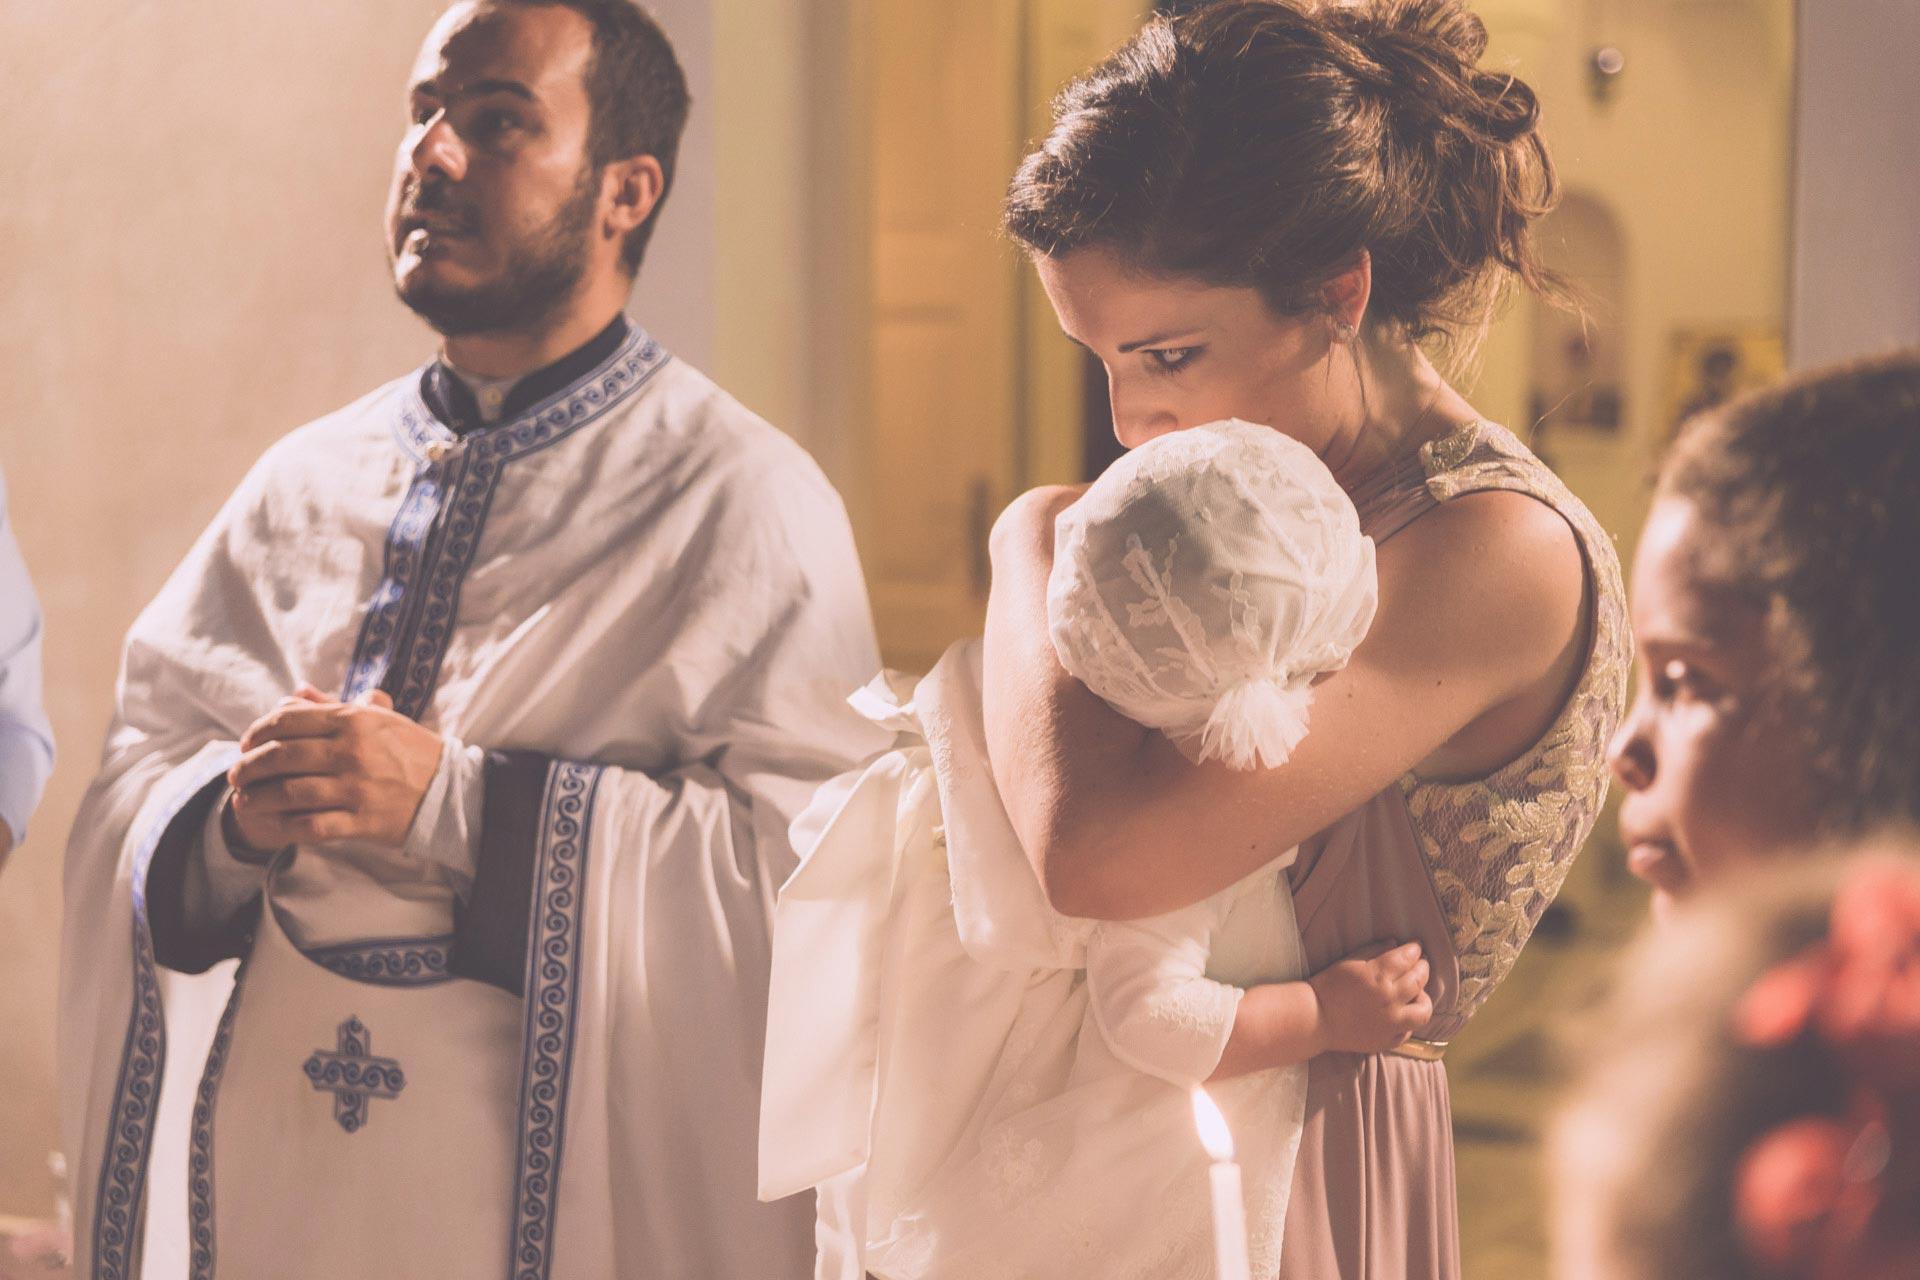 428 PhotoVaptisis Spetses vaptisi βαπτιση μωρο βαπτιστικά βαπριση σπετσες αγιος μαμας διακοσμηση βάπτισης γονείς νονά